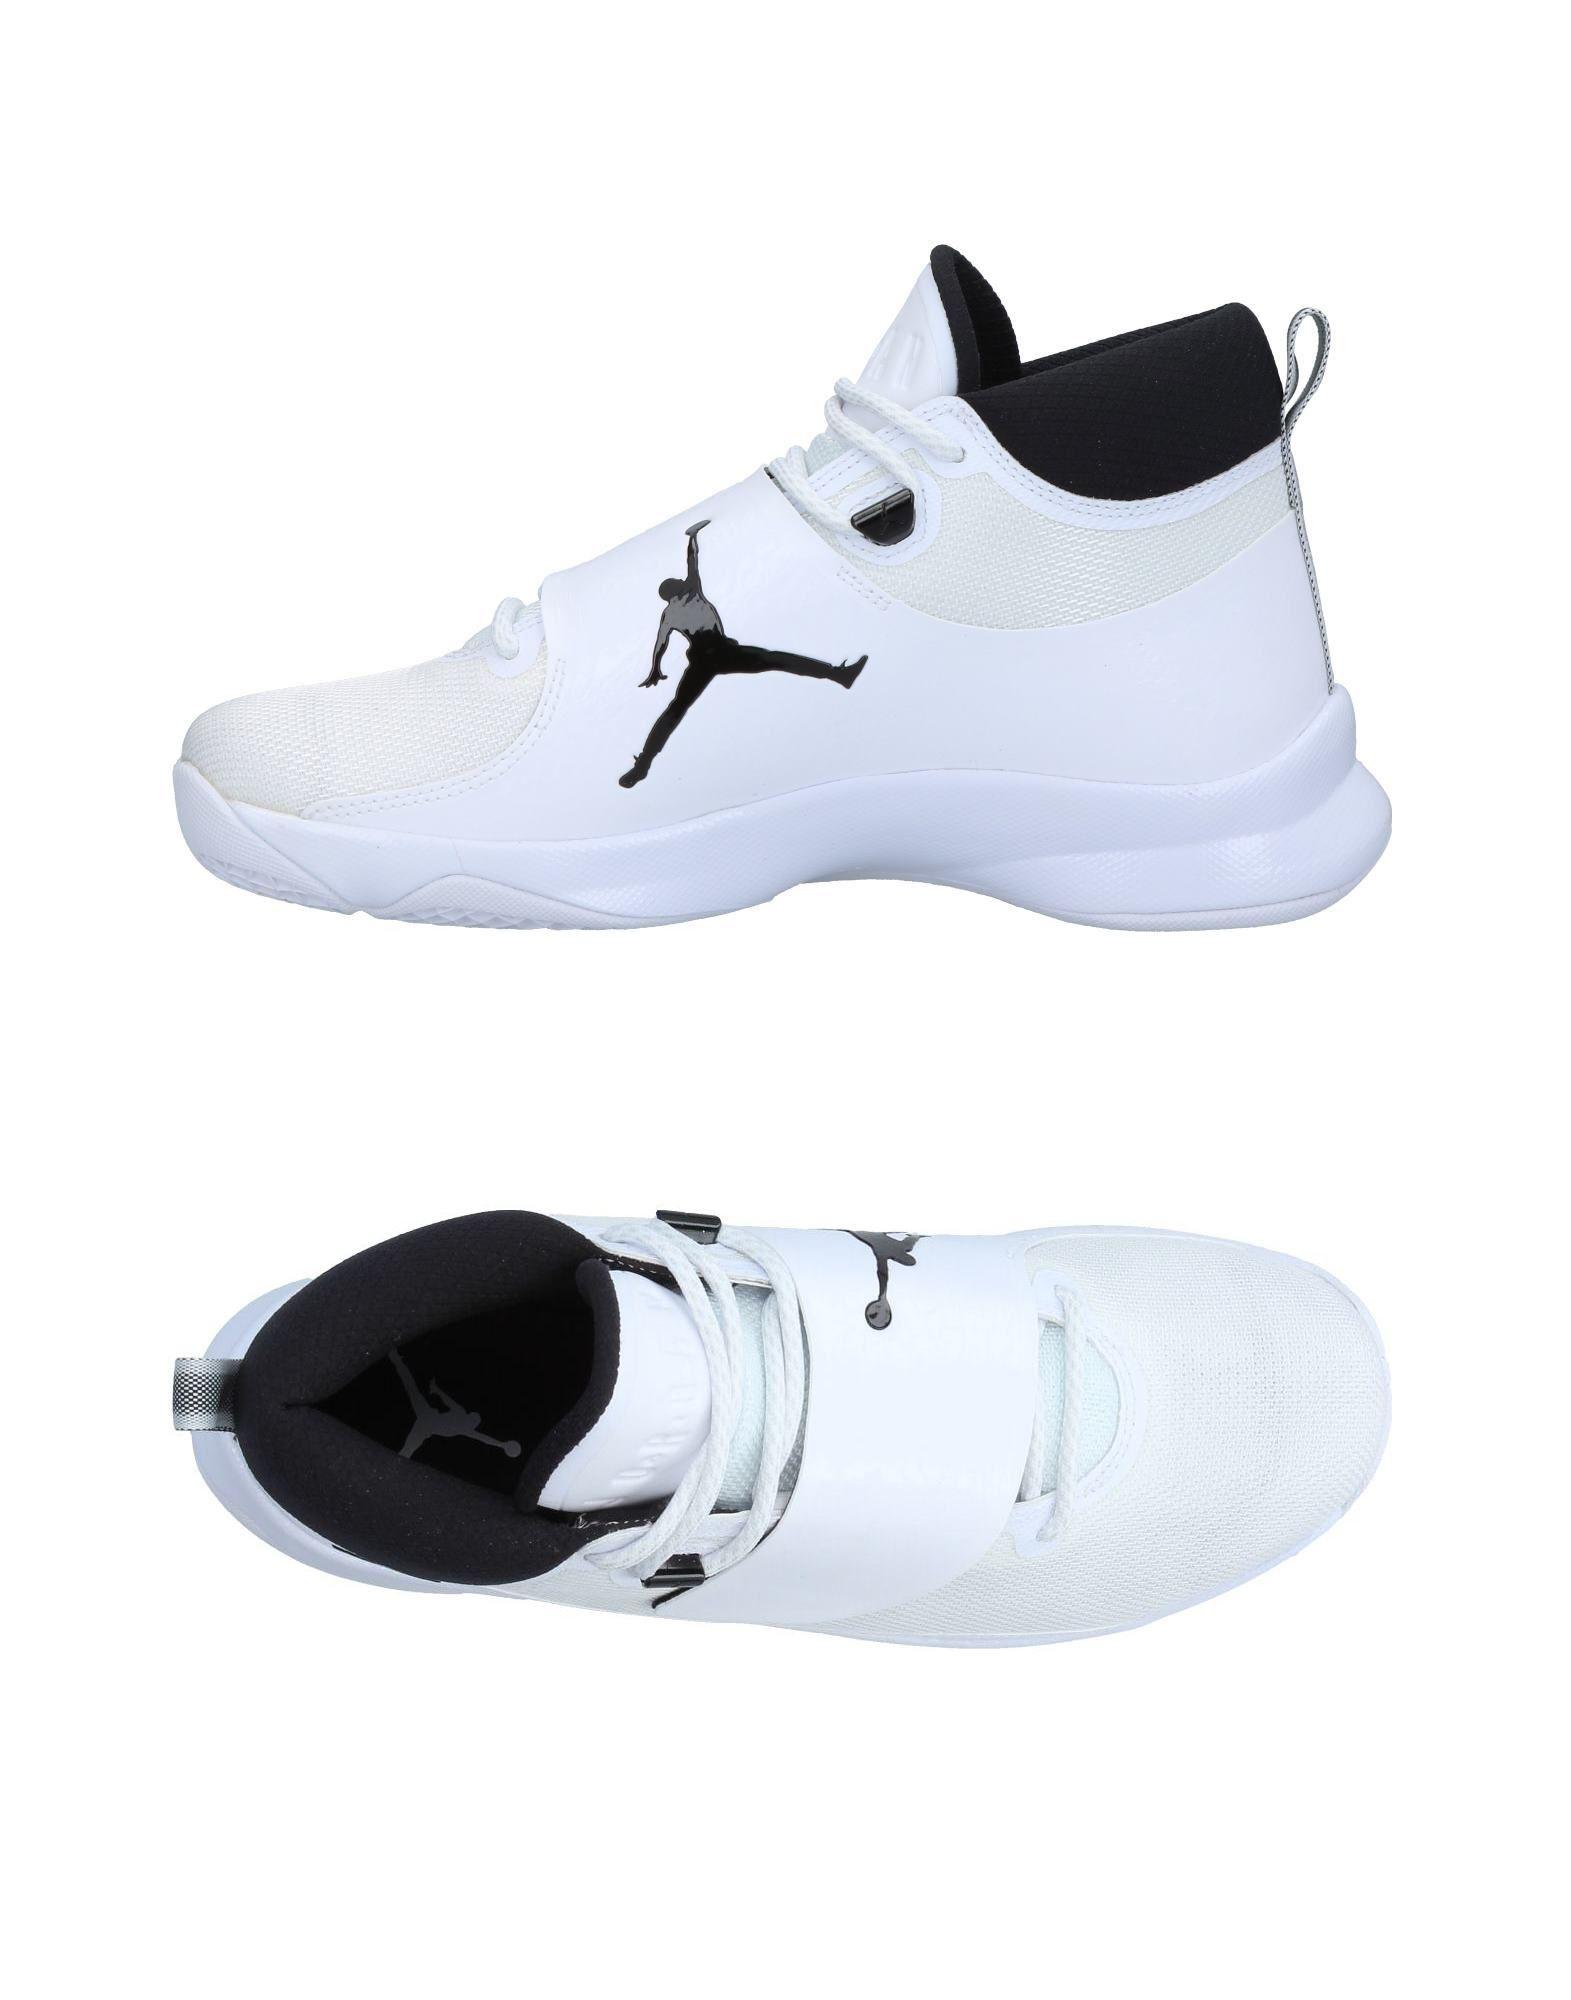 Moda Sneakers Jordan Uomo - 11382446GQ